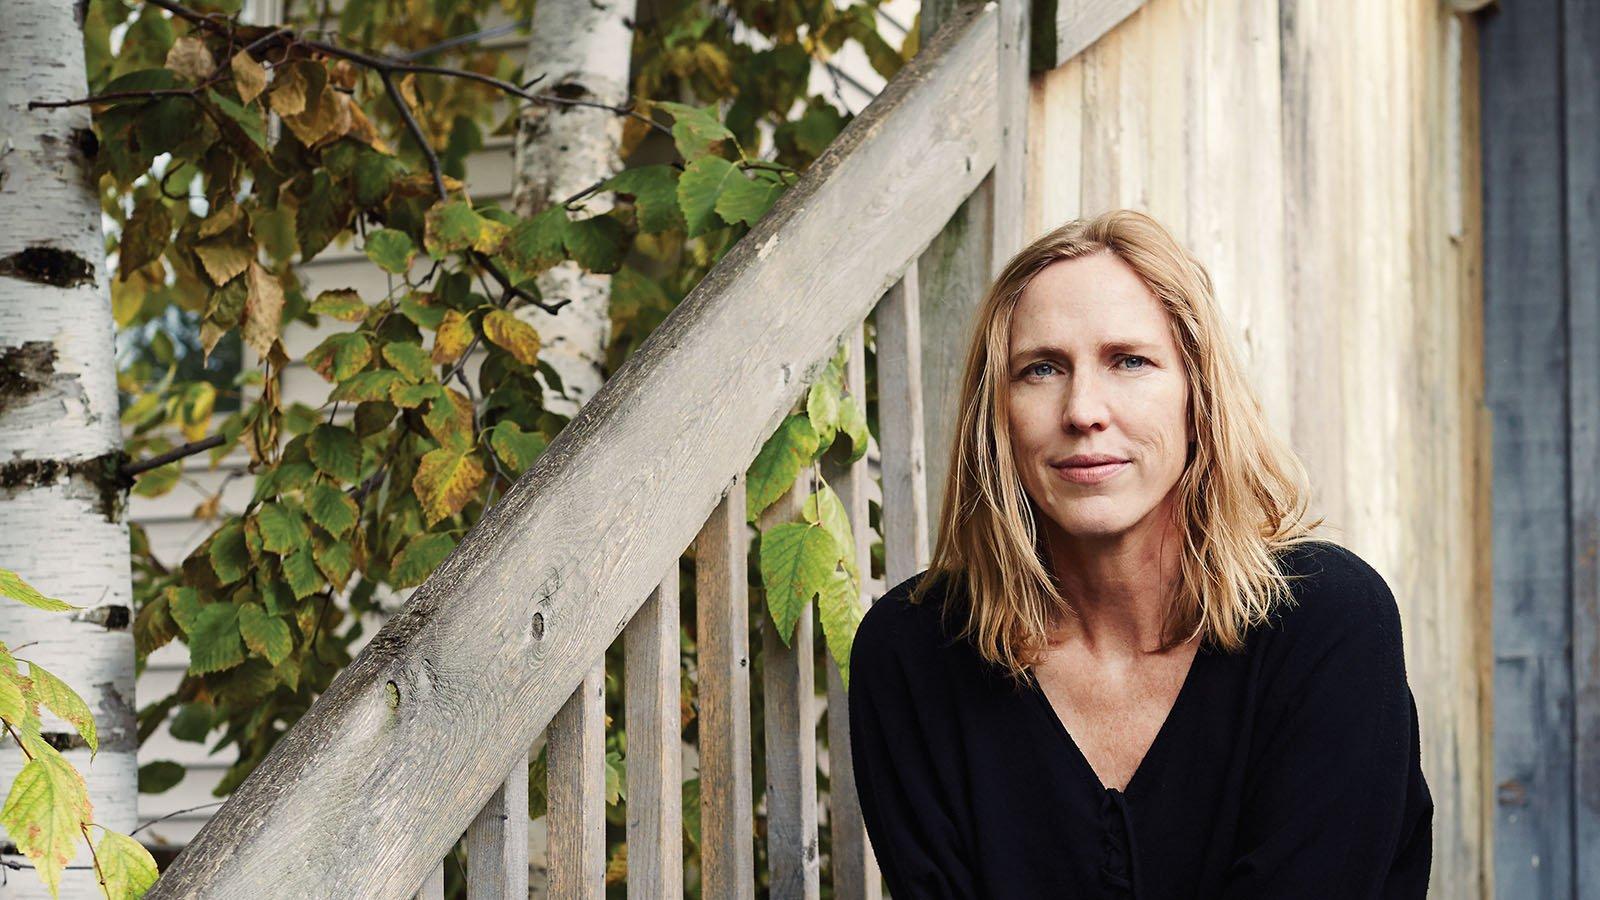 Miriam Toews, outside her Toronto home. Photograph by Jaime Hogge